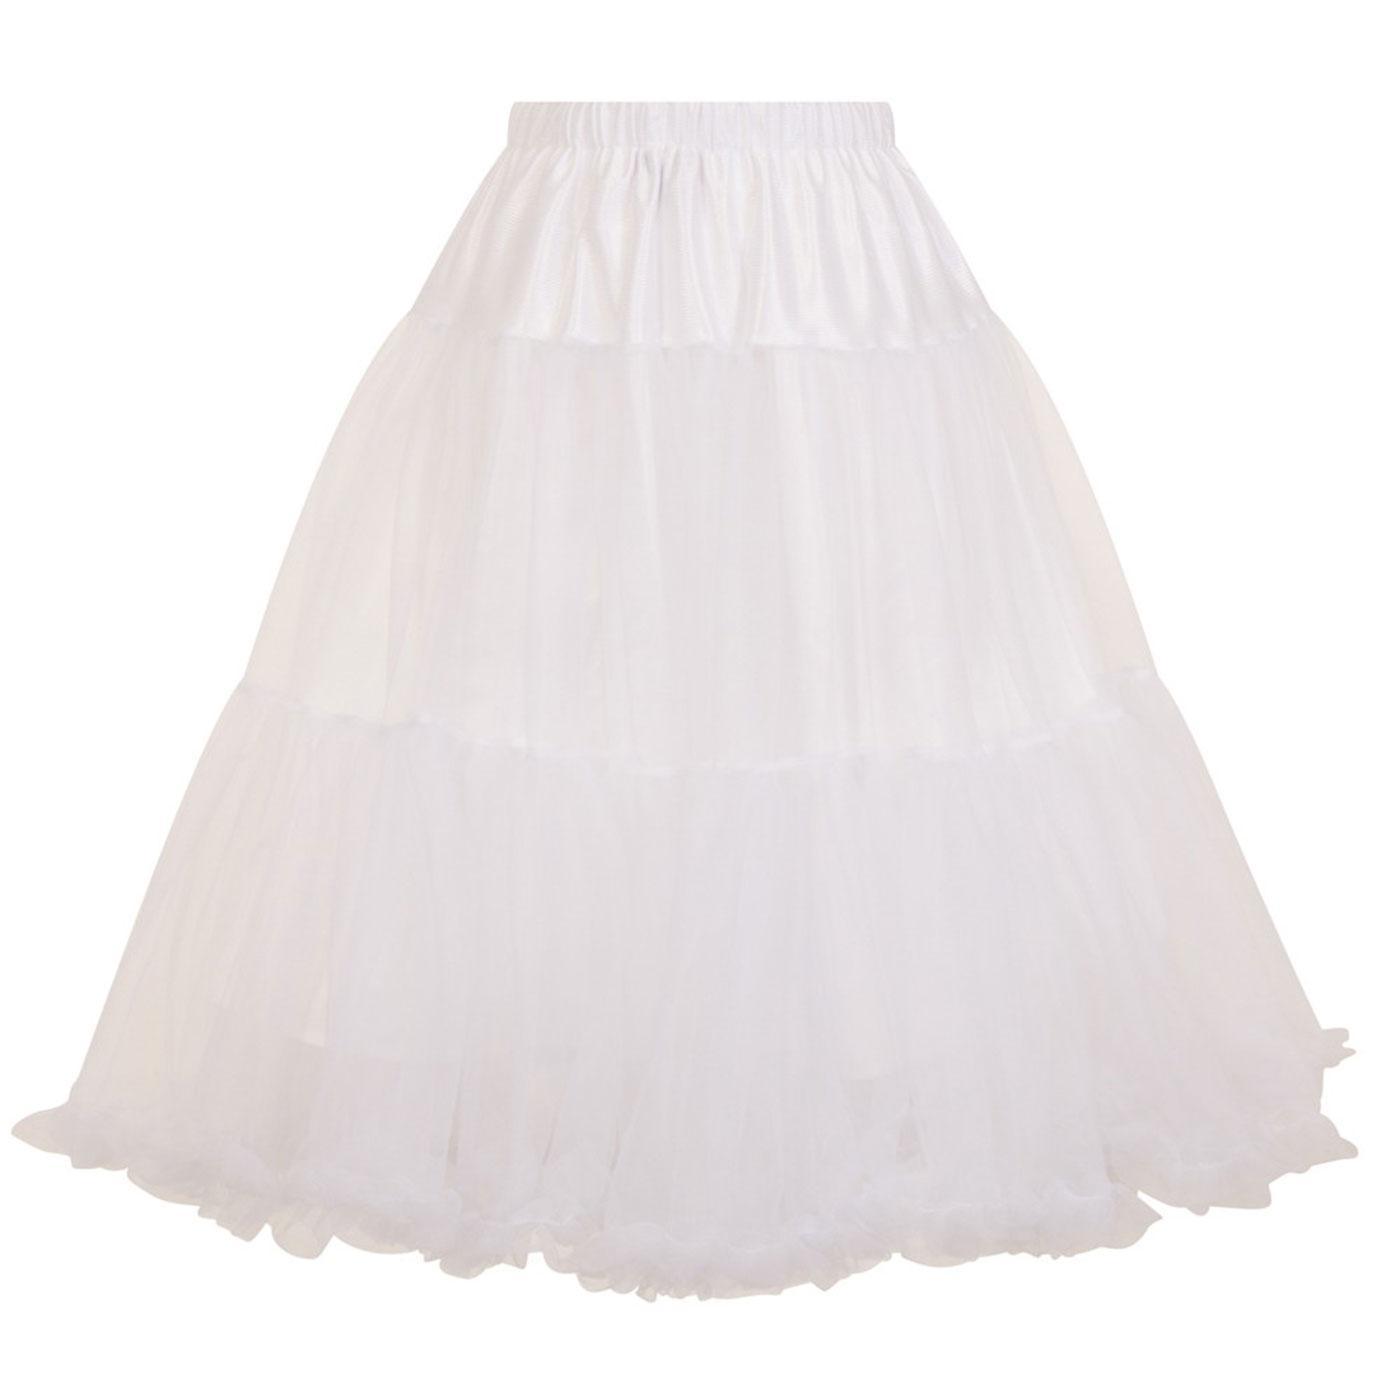 Polly HELL BUNNY Retro 50s Crinoline Petticoat W